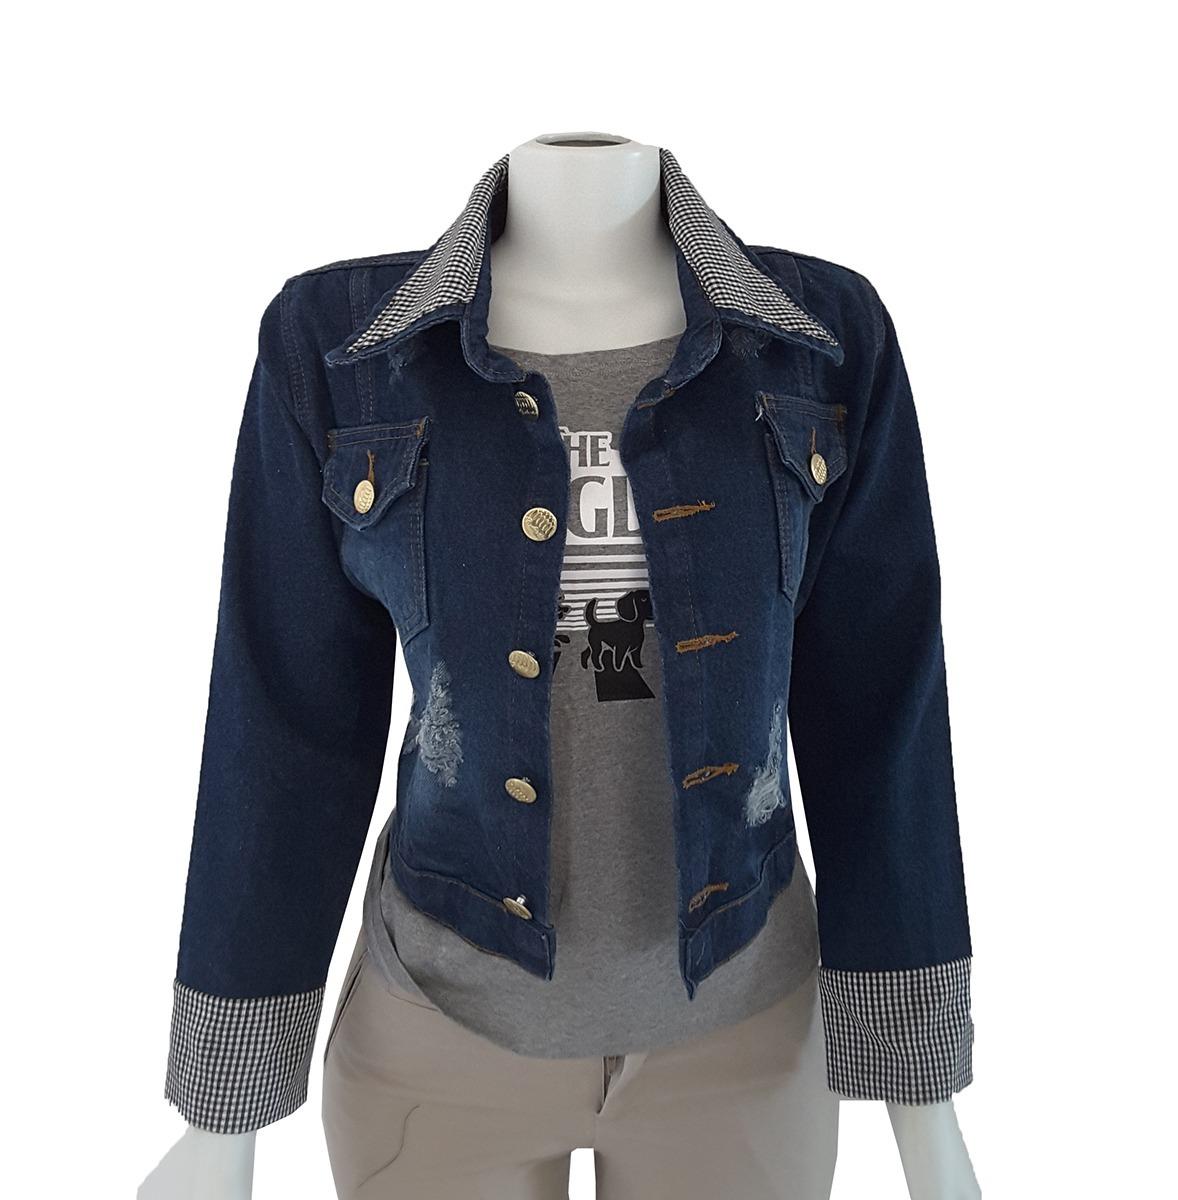 da8c42f7dc jaqueta jeans feminina customizada rasgada manga xadrez. Carregando zoom.